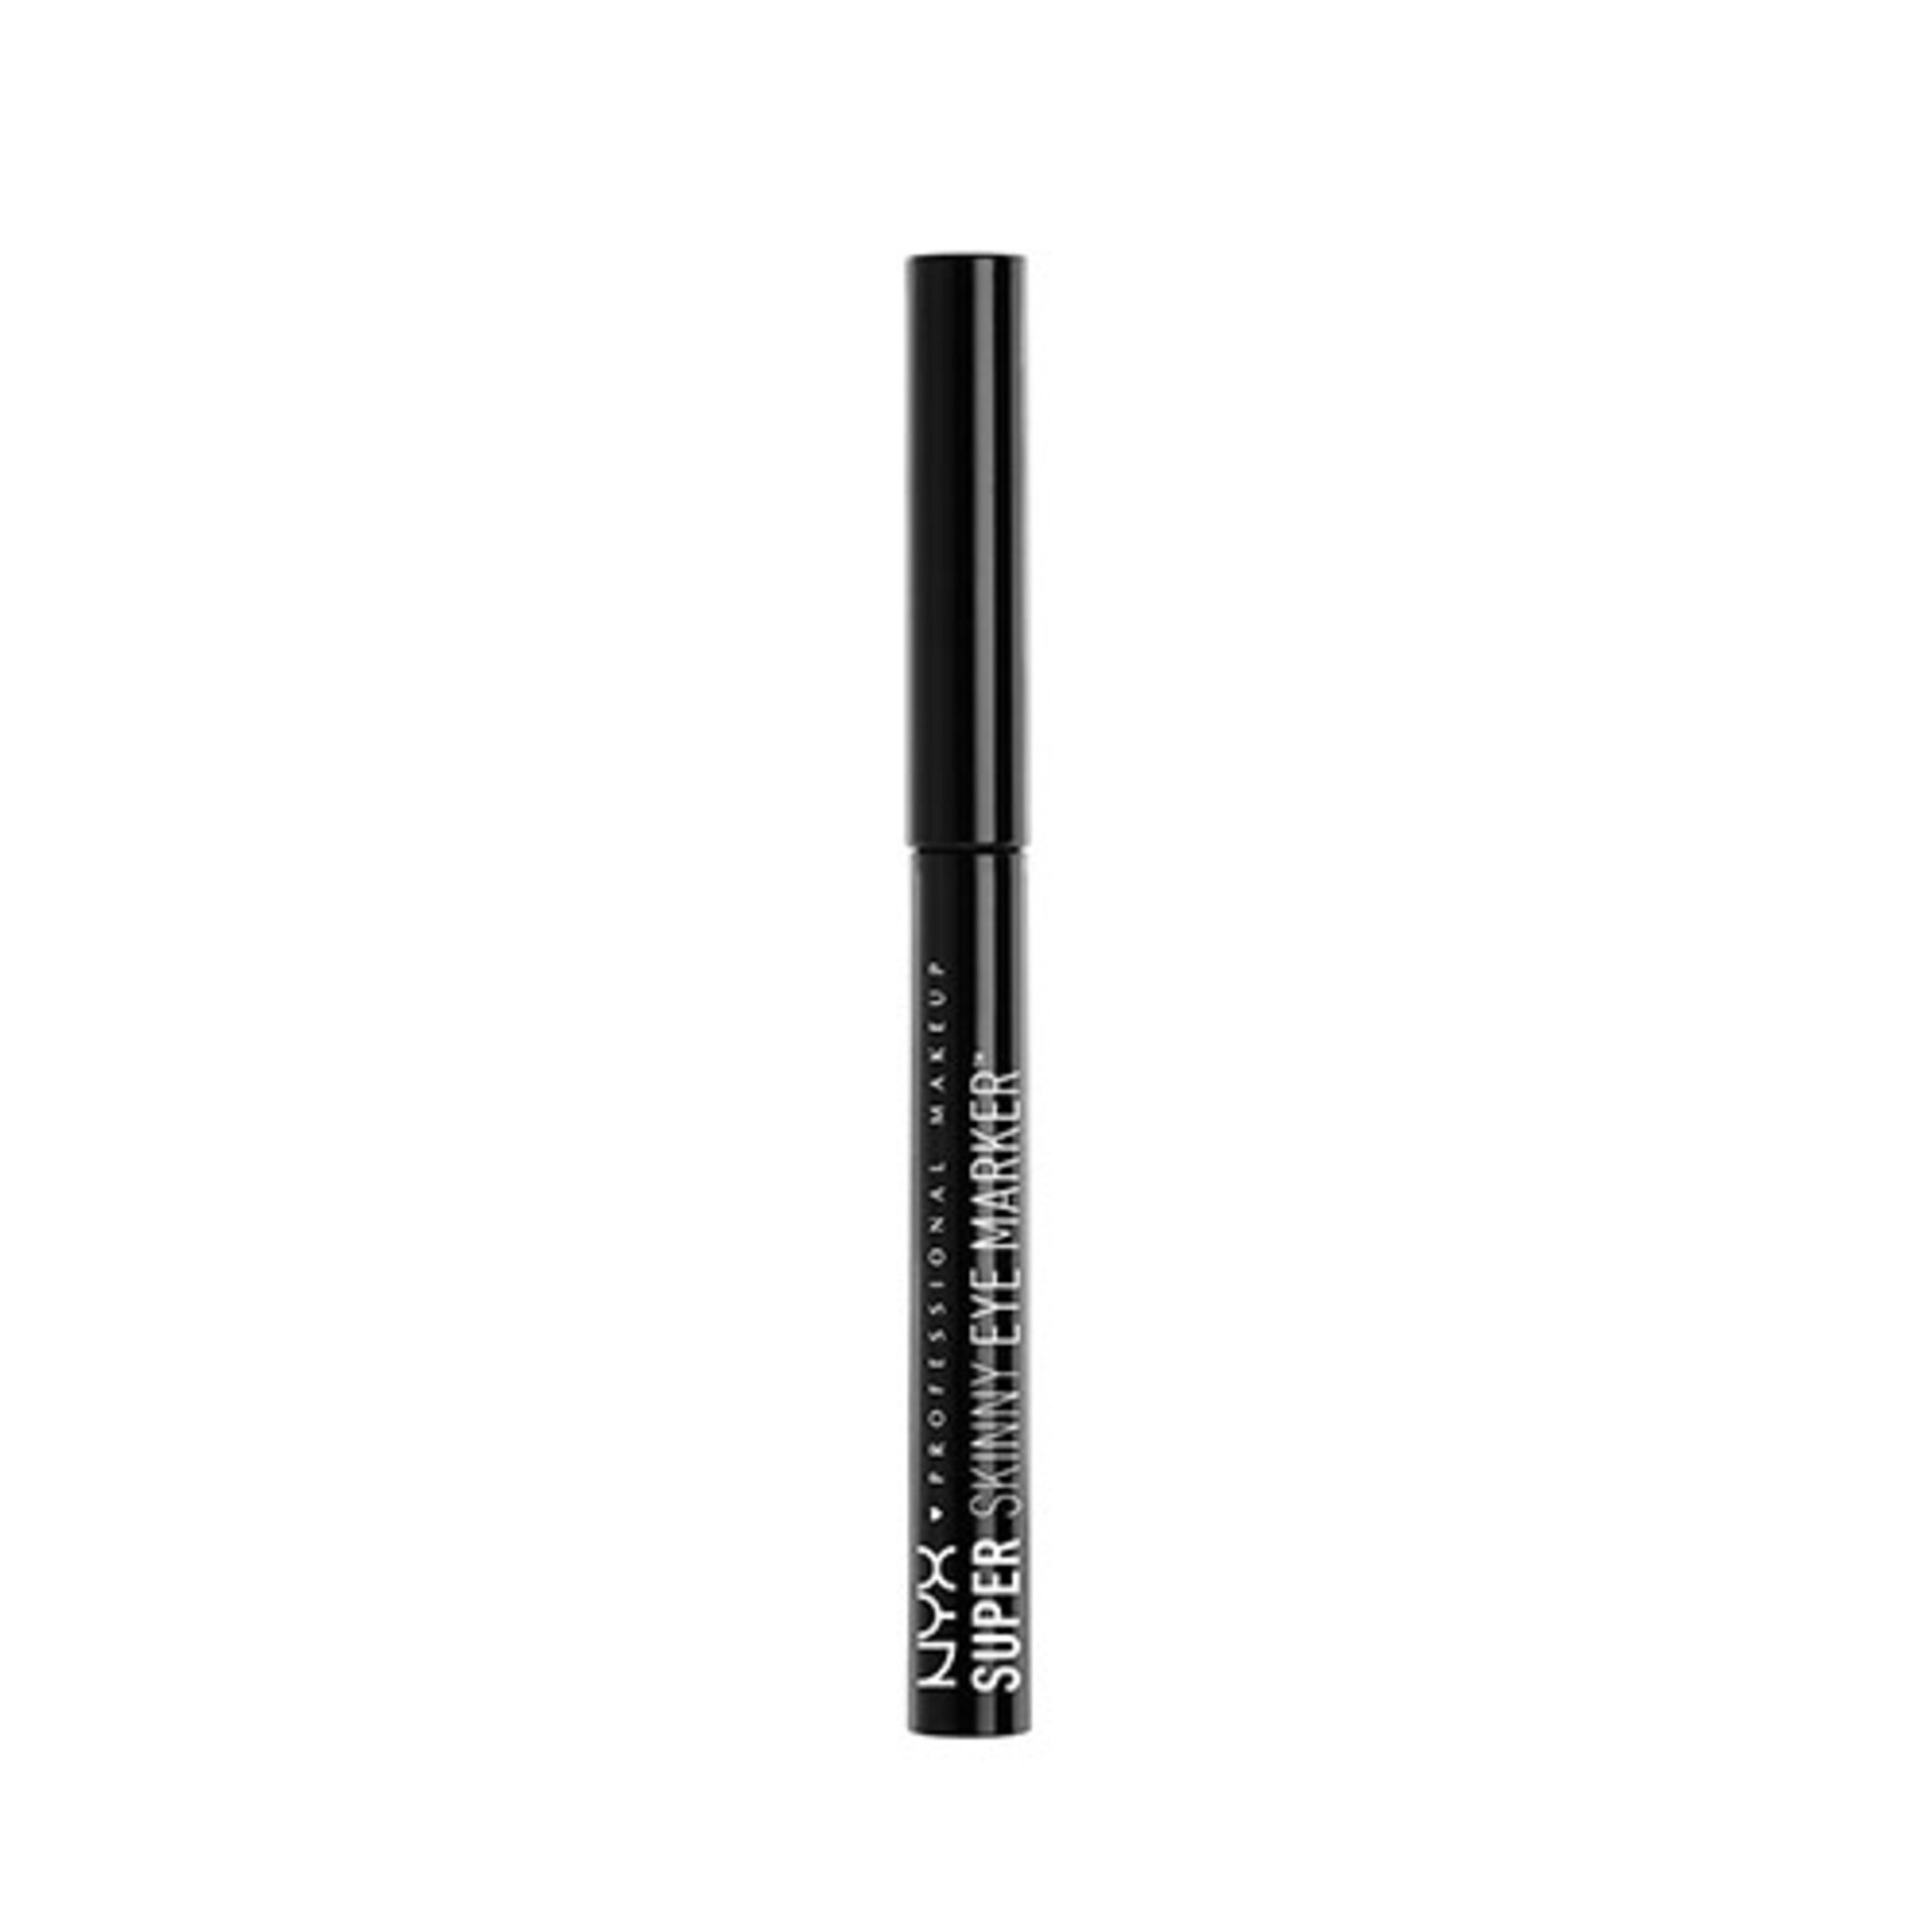 Super Skinny Eye Marker Eyeliner, 1,1 ML